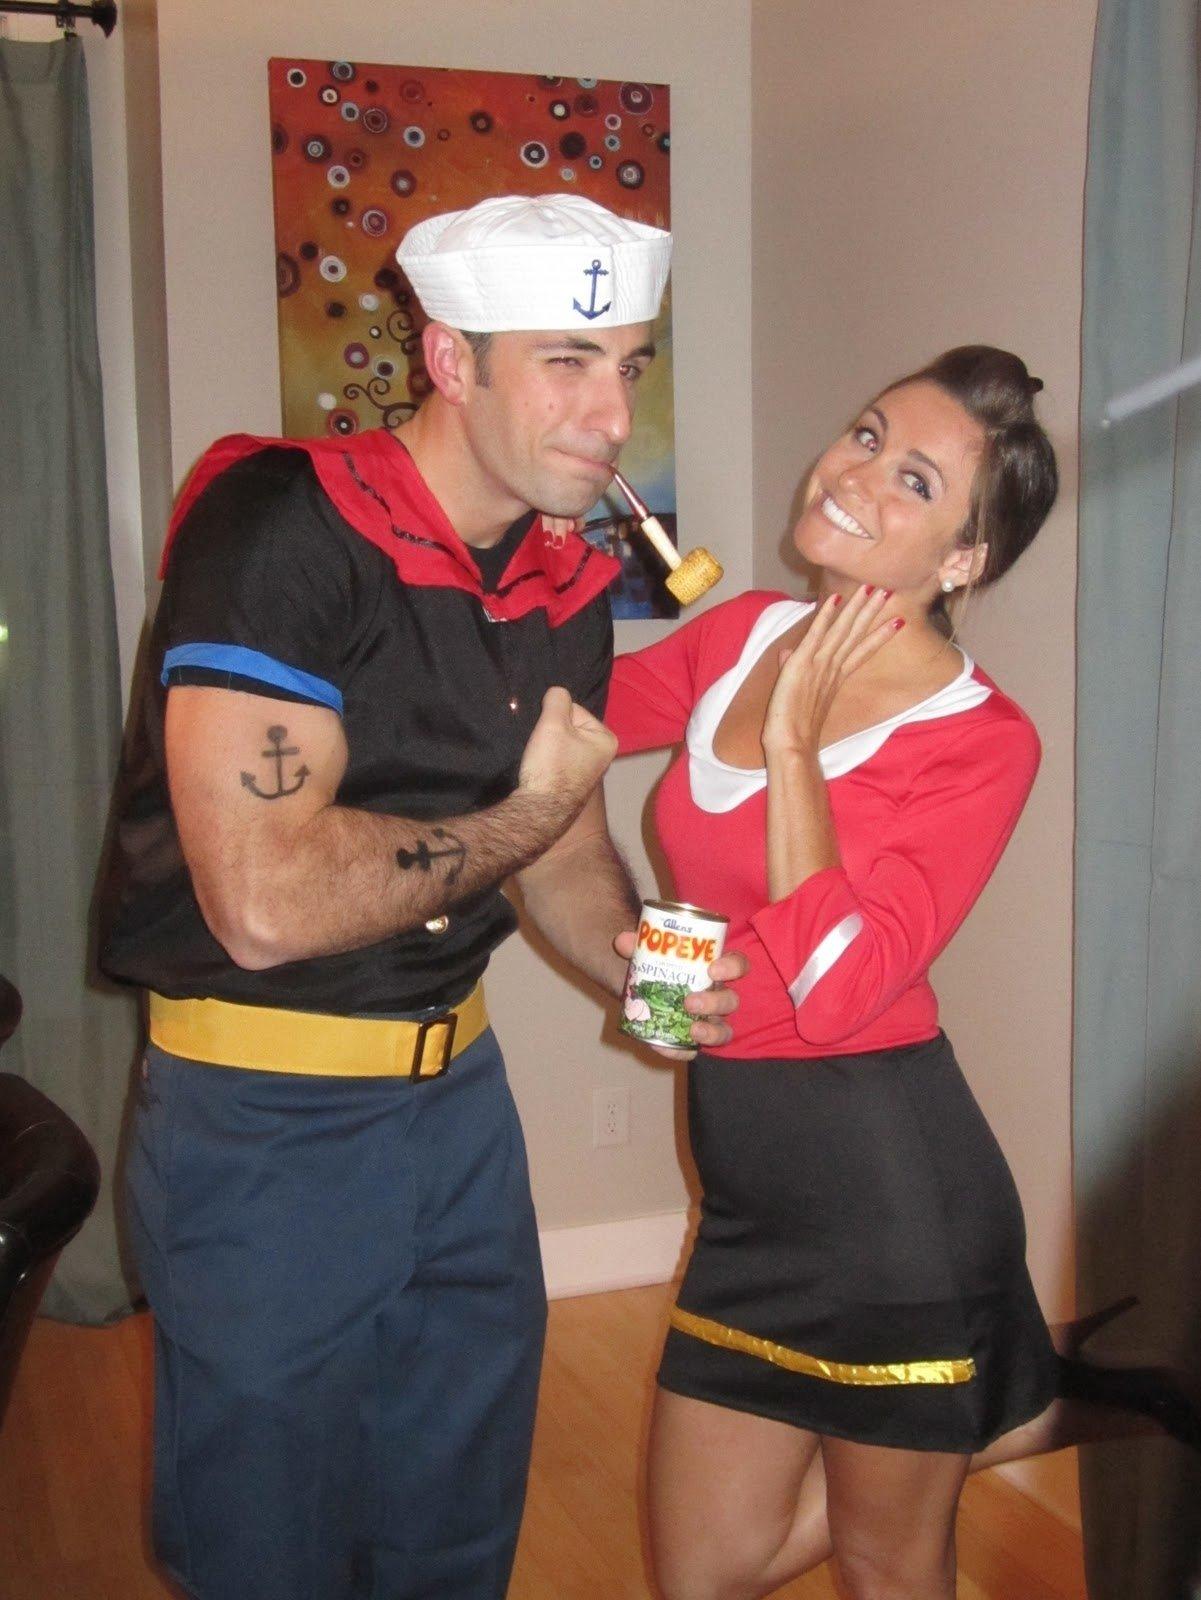 10 Spectacular Cool Couple Halloween Costume Ideas 25 genius diy couples costumes brit co 10 2021